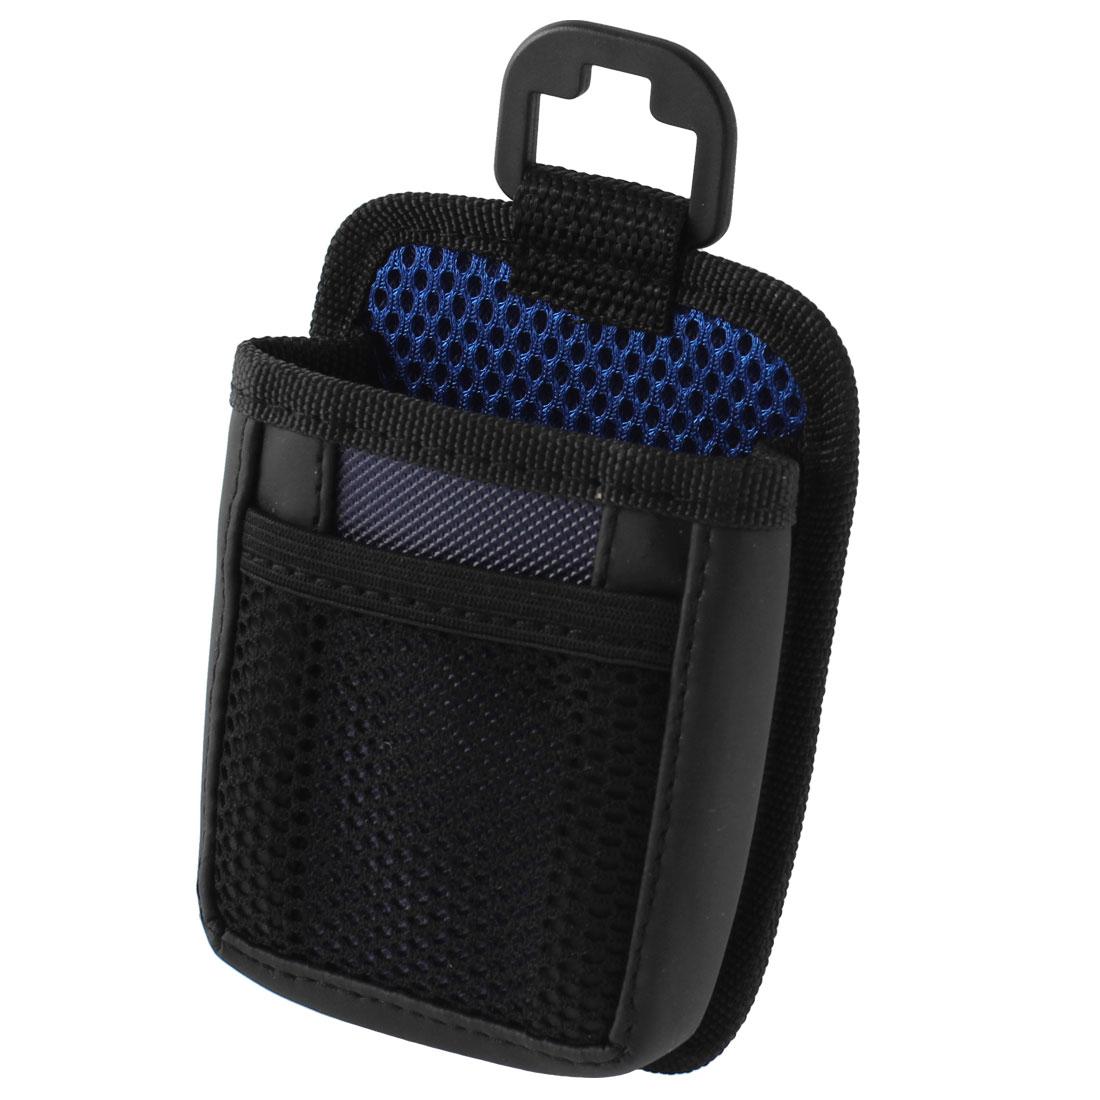 Car Auto Black Blue Nylon Meshy Air Vent Phone Bag Pen Pouch Holder